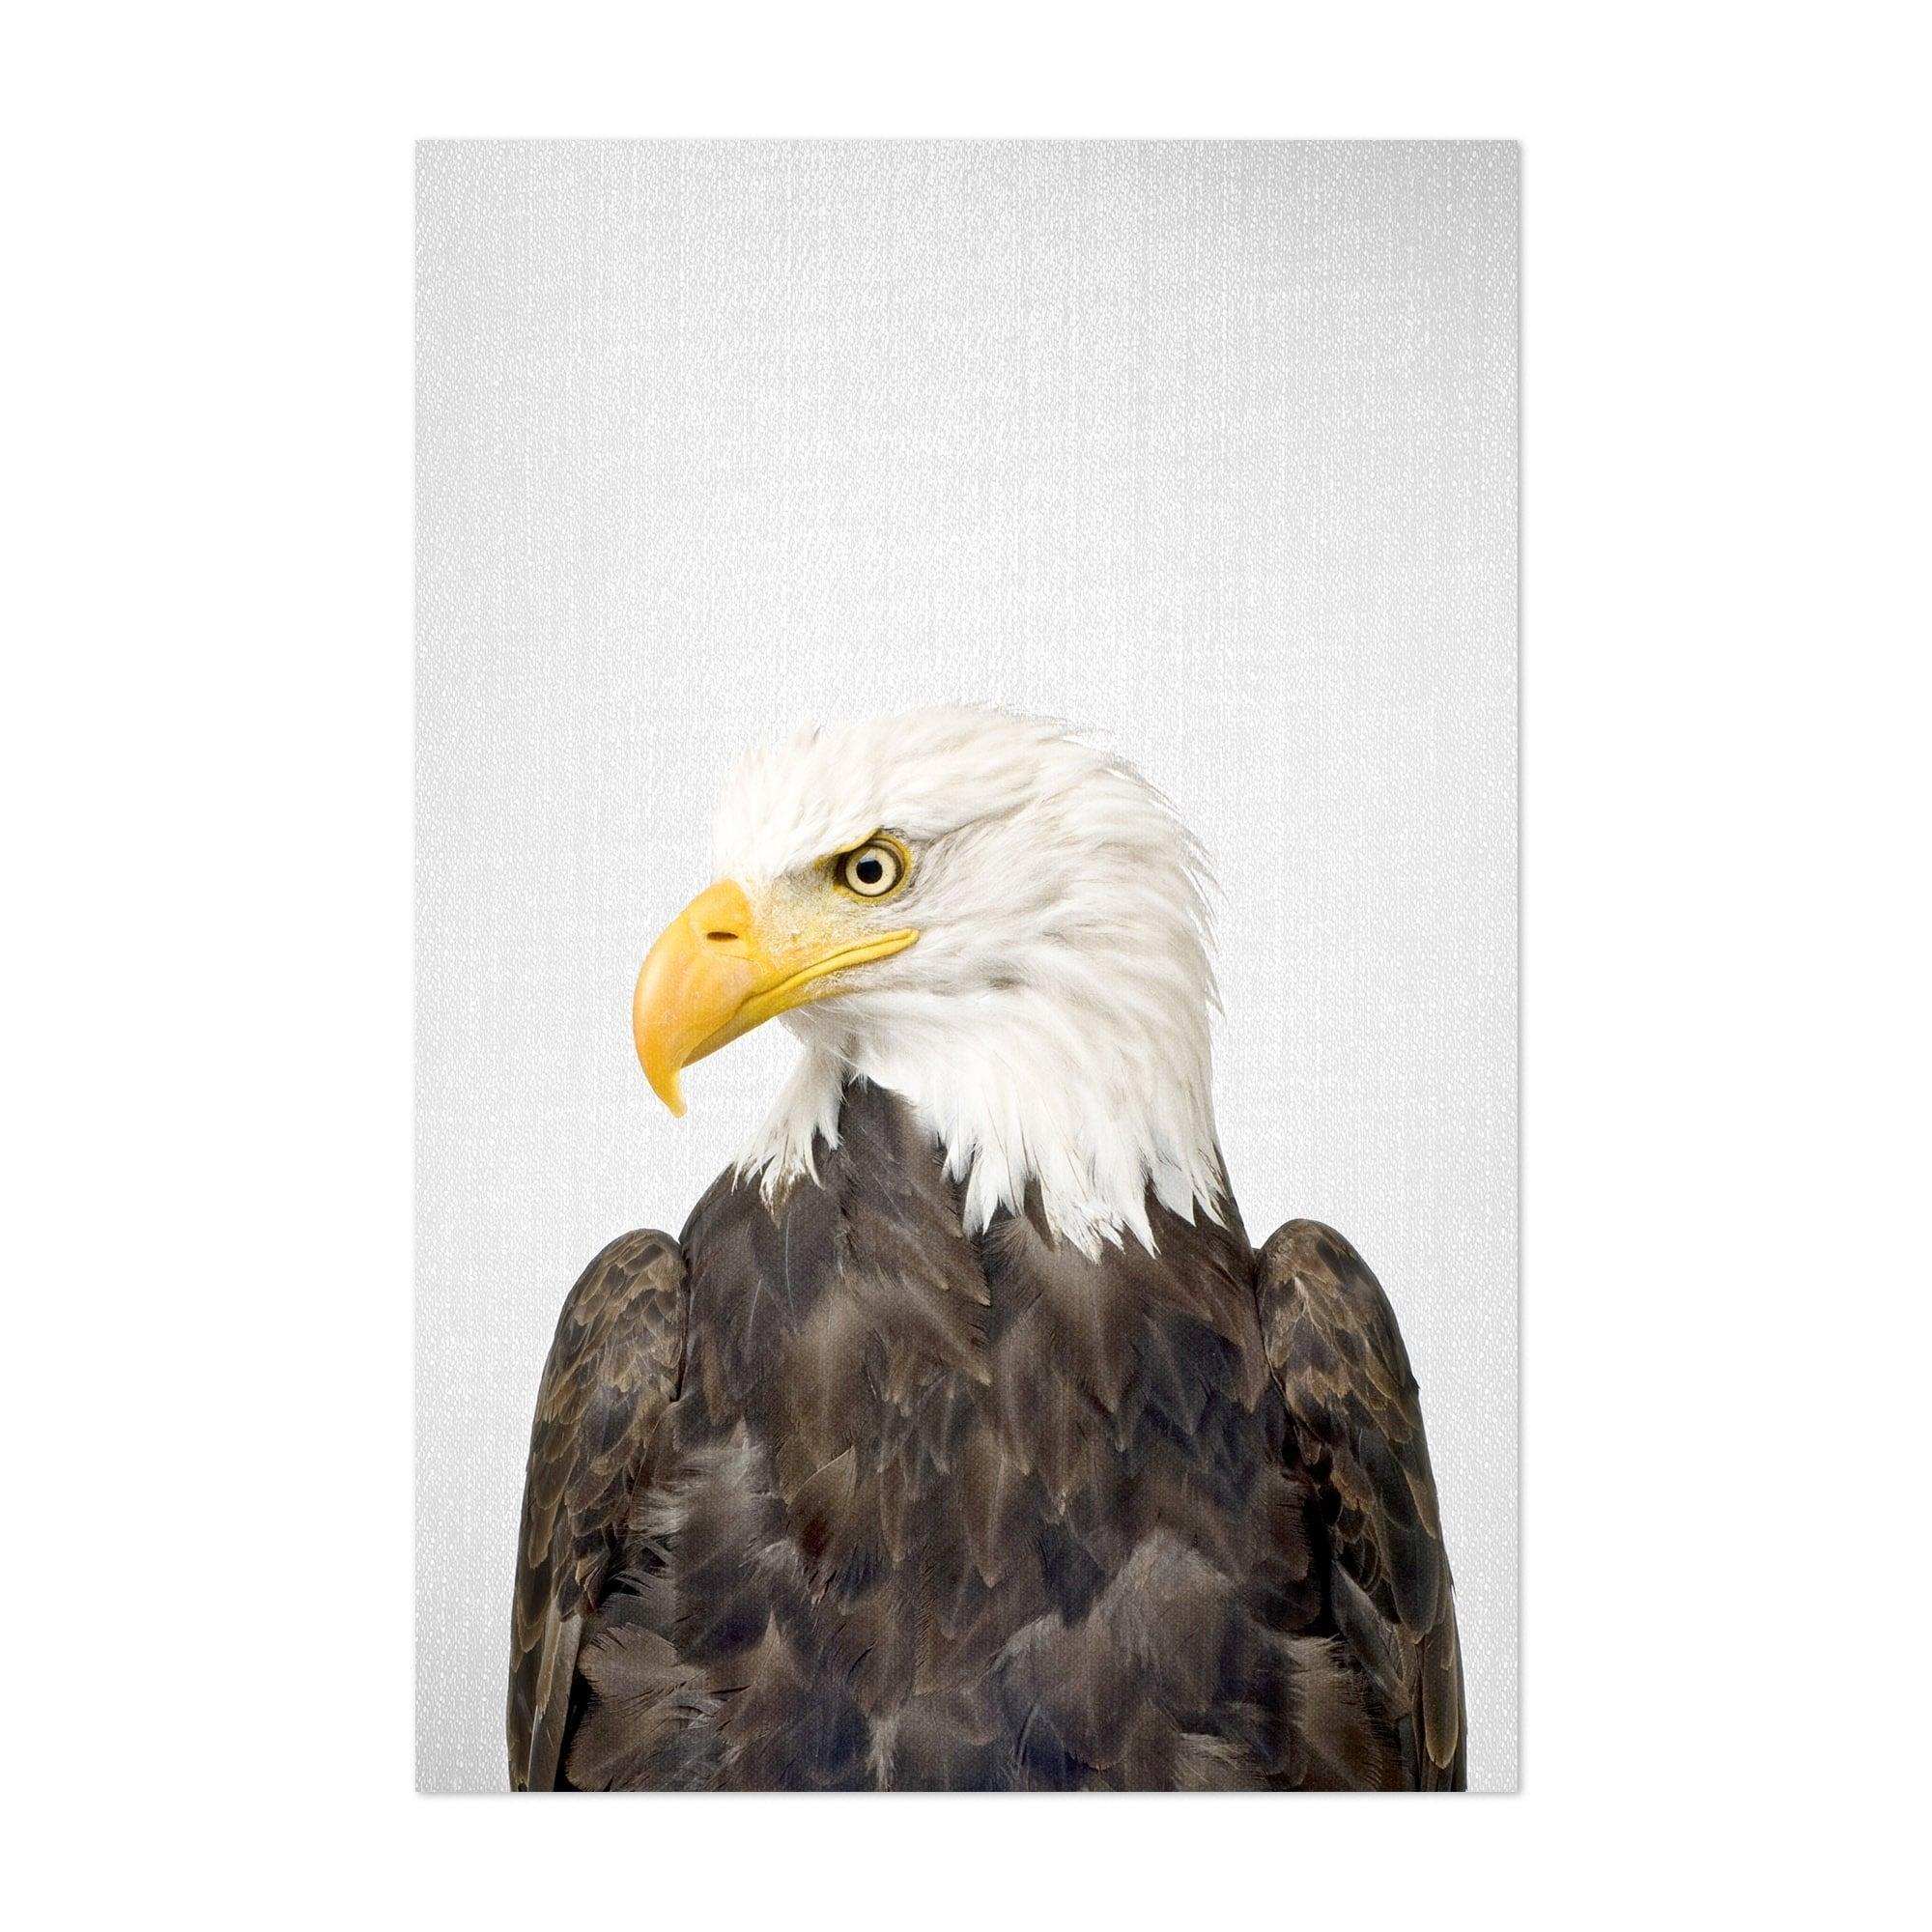 Shop Noir Gallery American Bald Eagle Patriot Bird Unframed Art